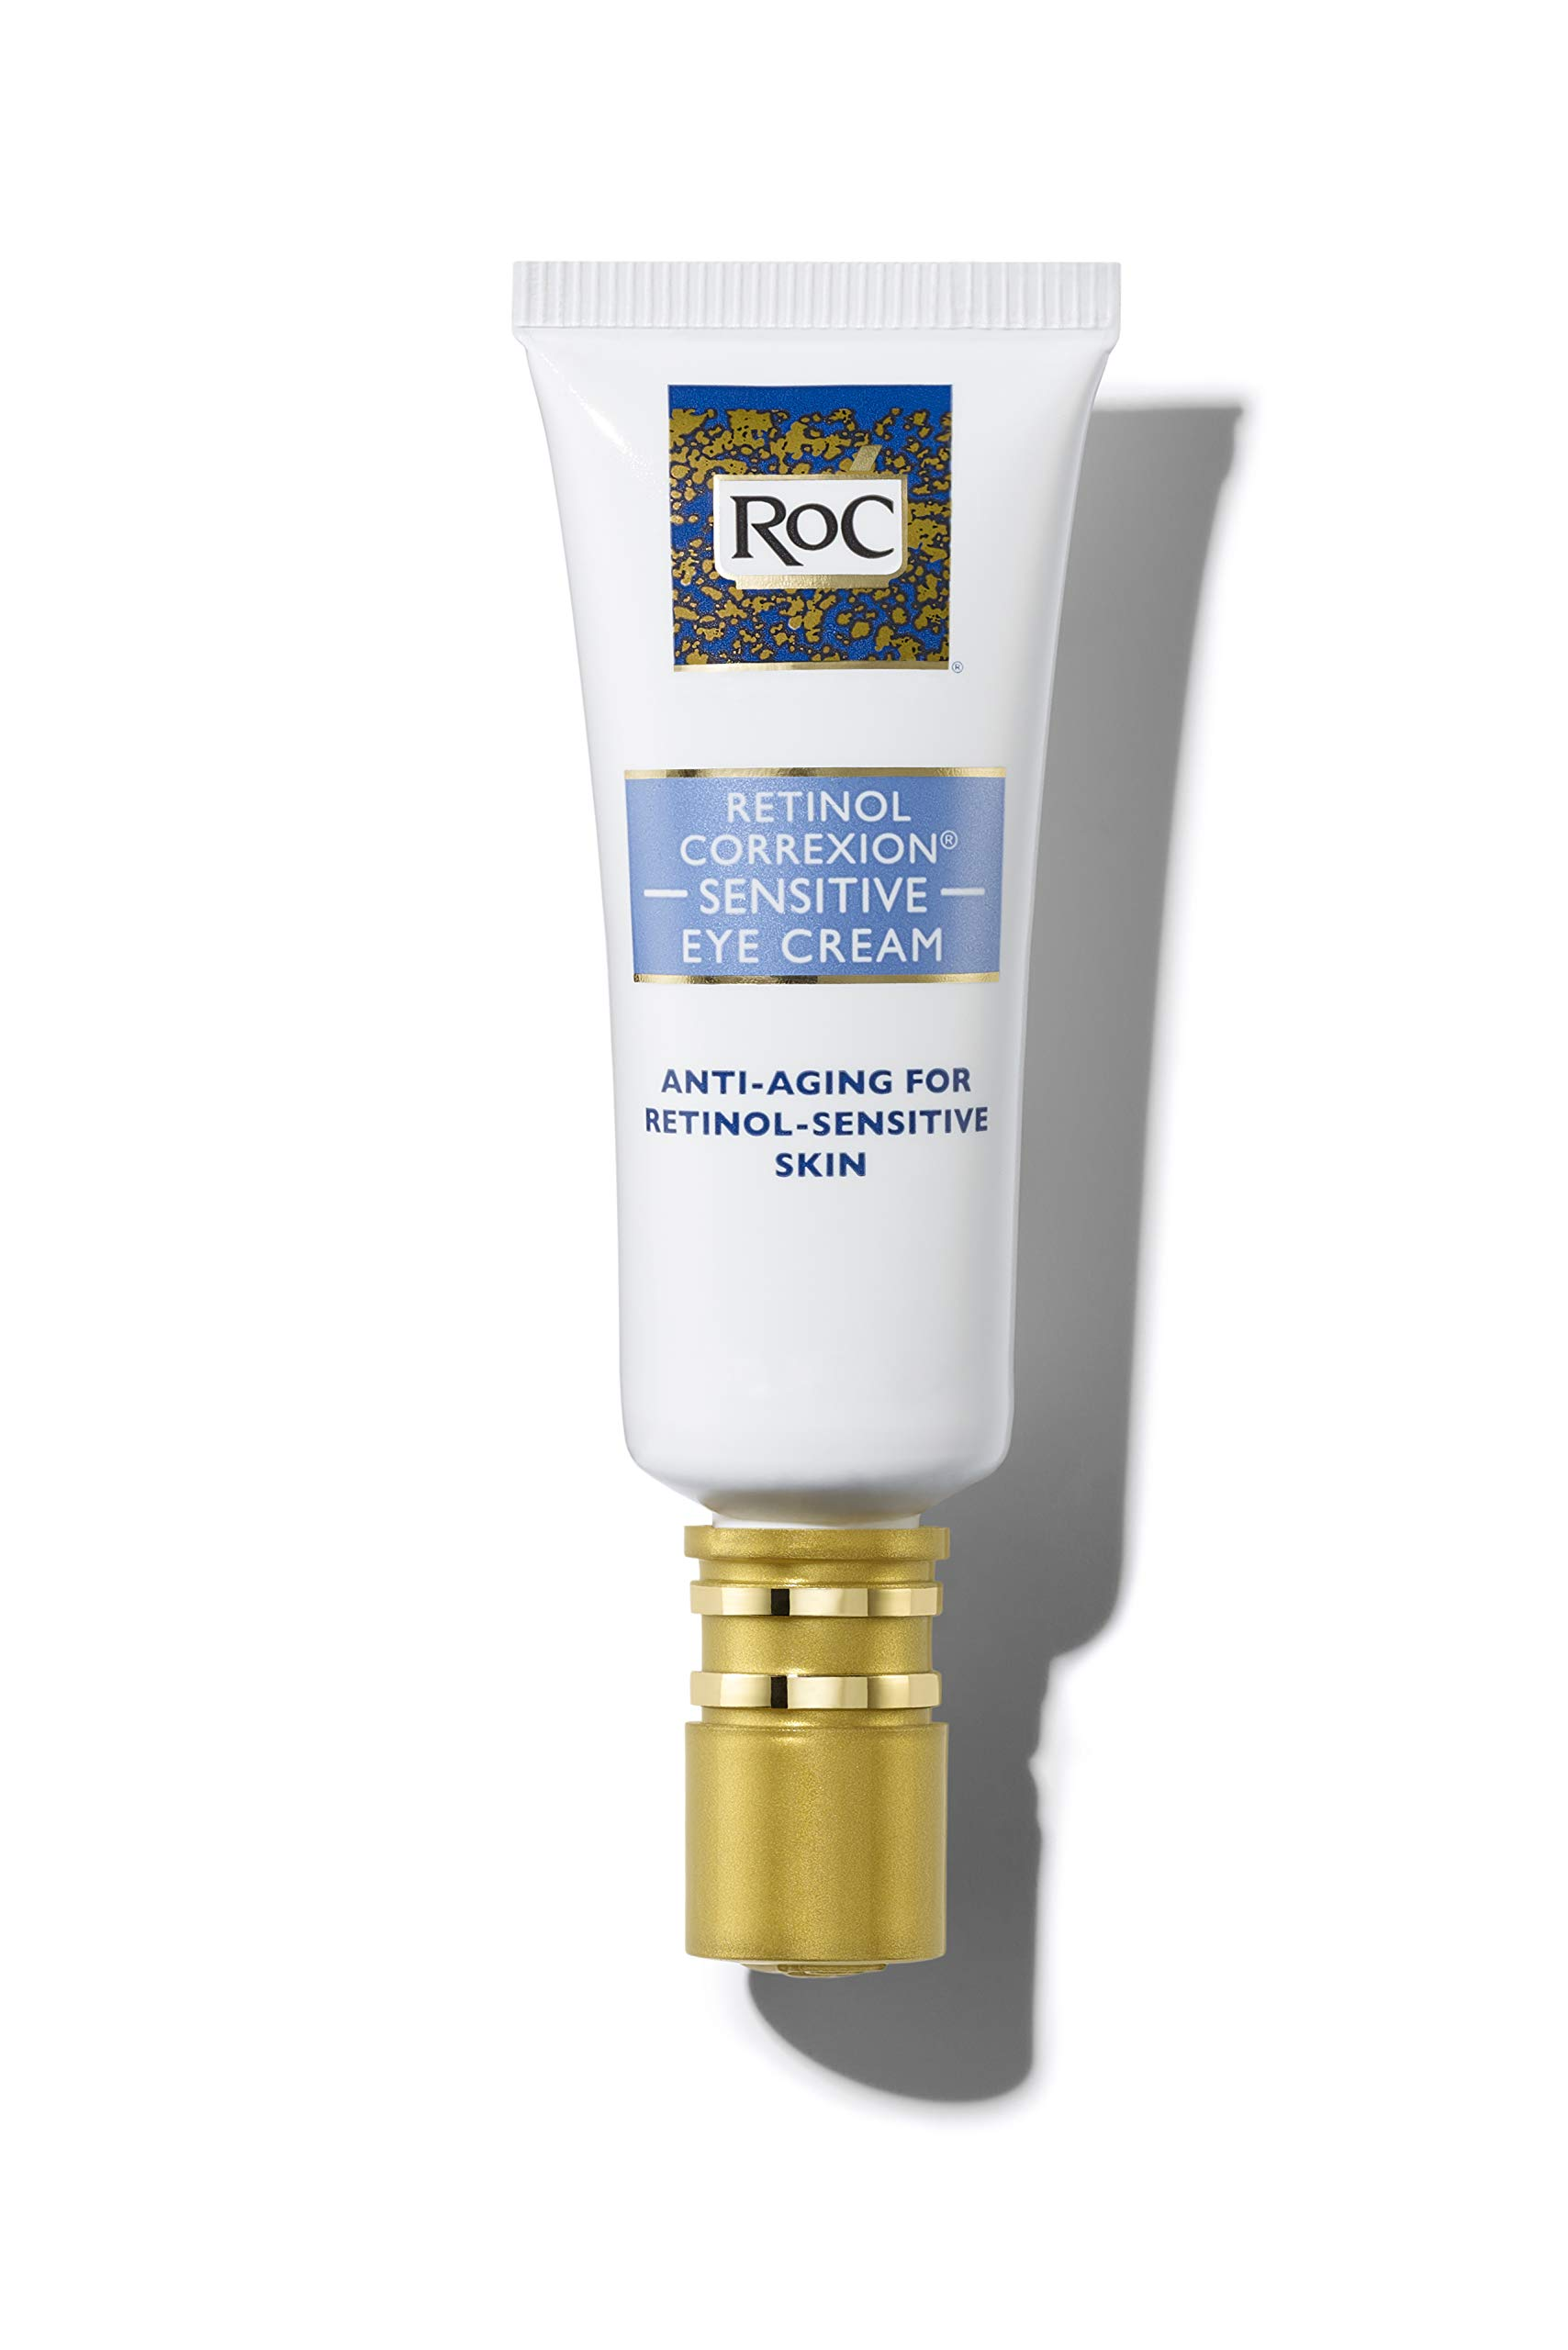 RoC Retinol Correxion Anti-Aging Eye Cream for Sensitive Skin, Anti-Wrinkle Treatment with milder retinol formula that helps condition skin to retinoids.5 fl. oz by RoC